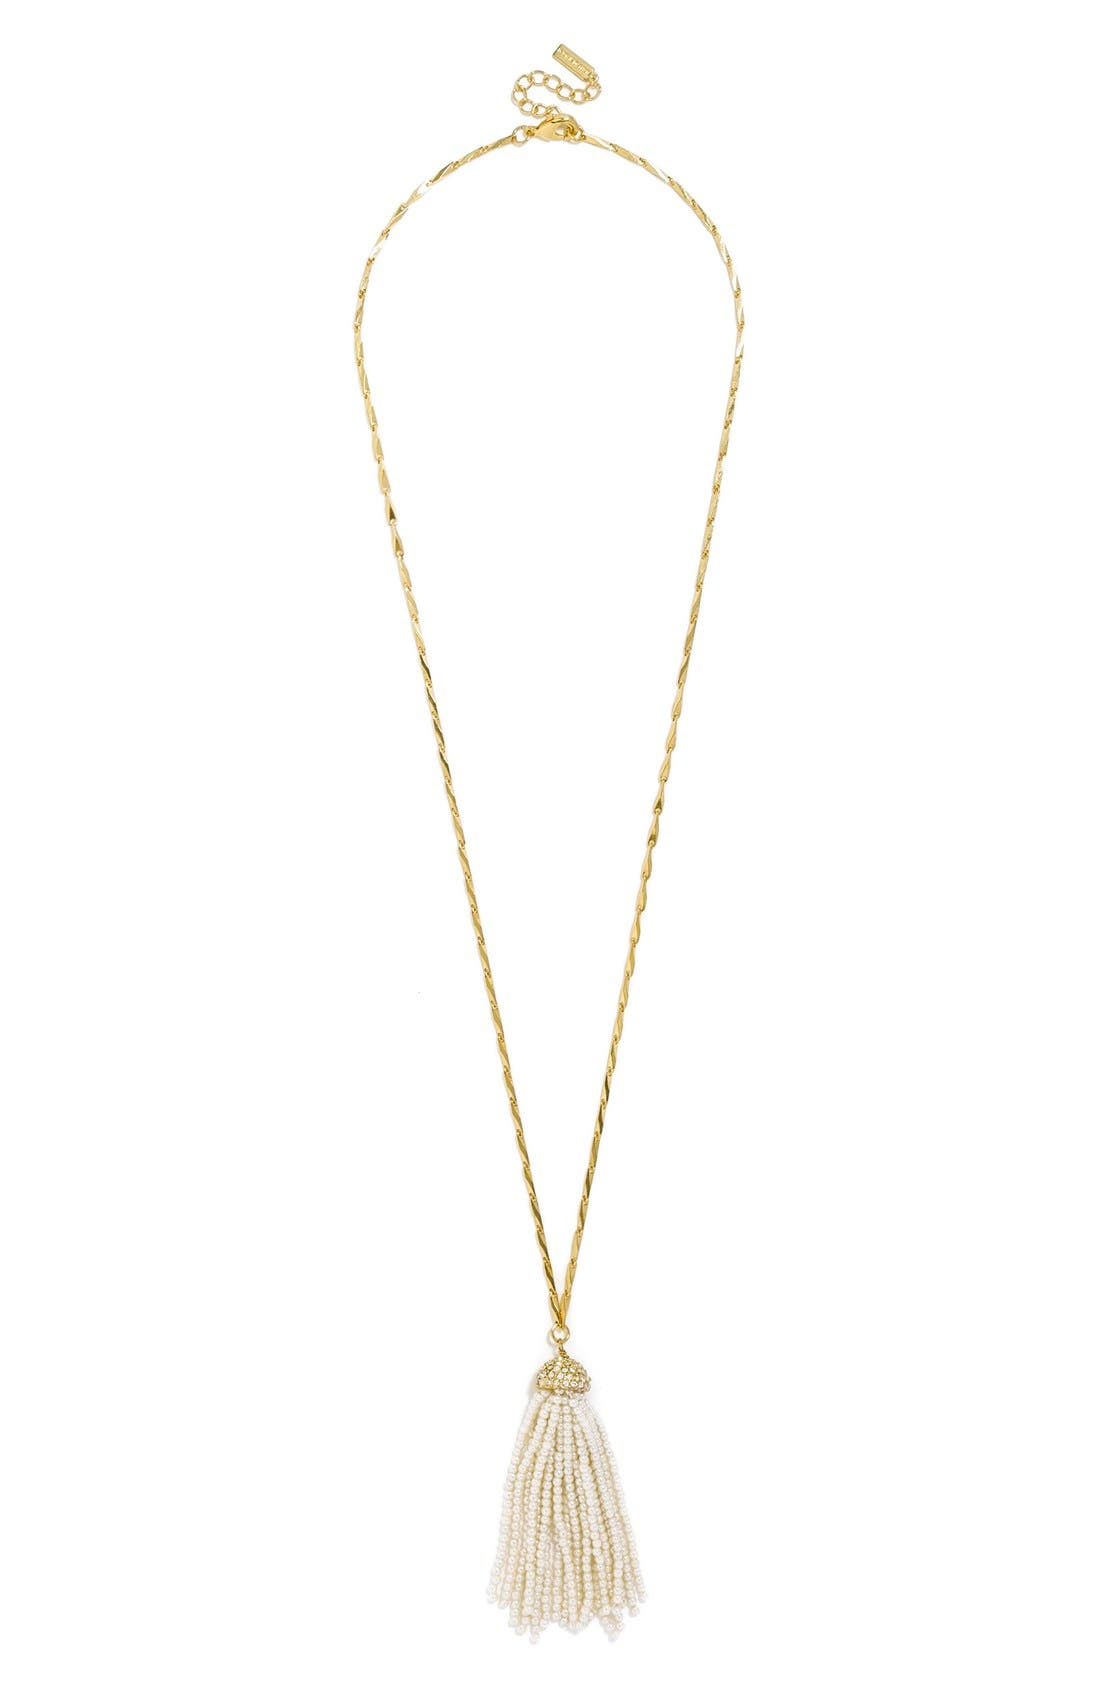 Main Image - BaubleBar Mini Faux Pearl Tassel Pendant Necklace